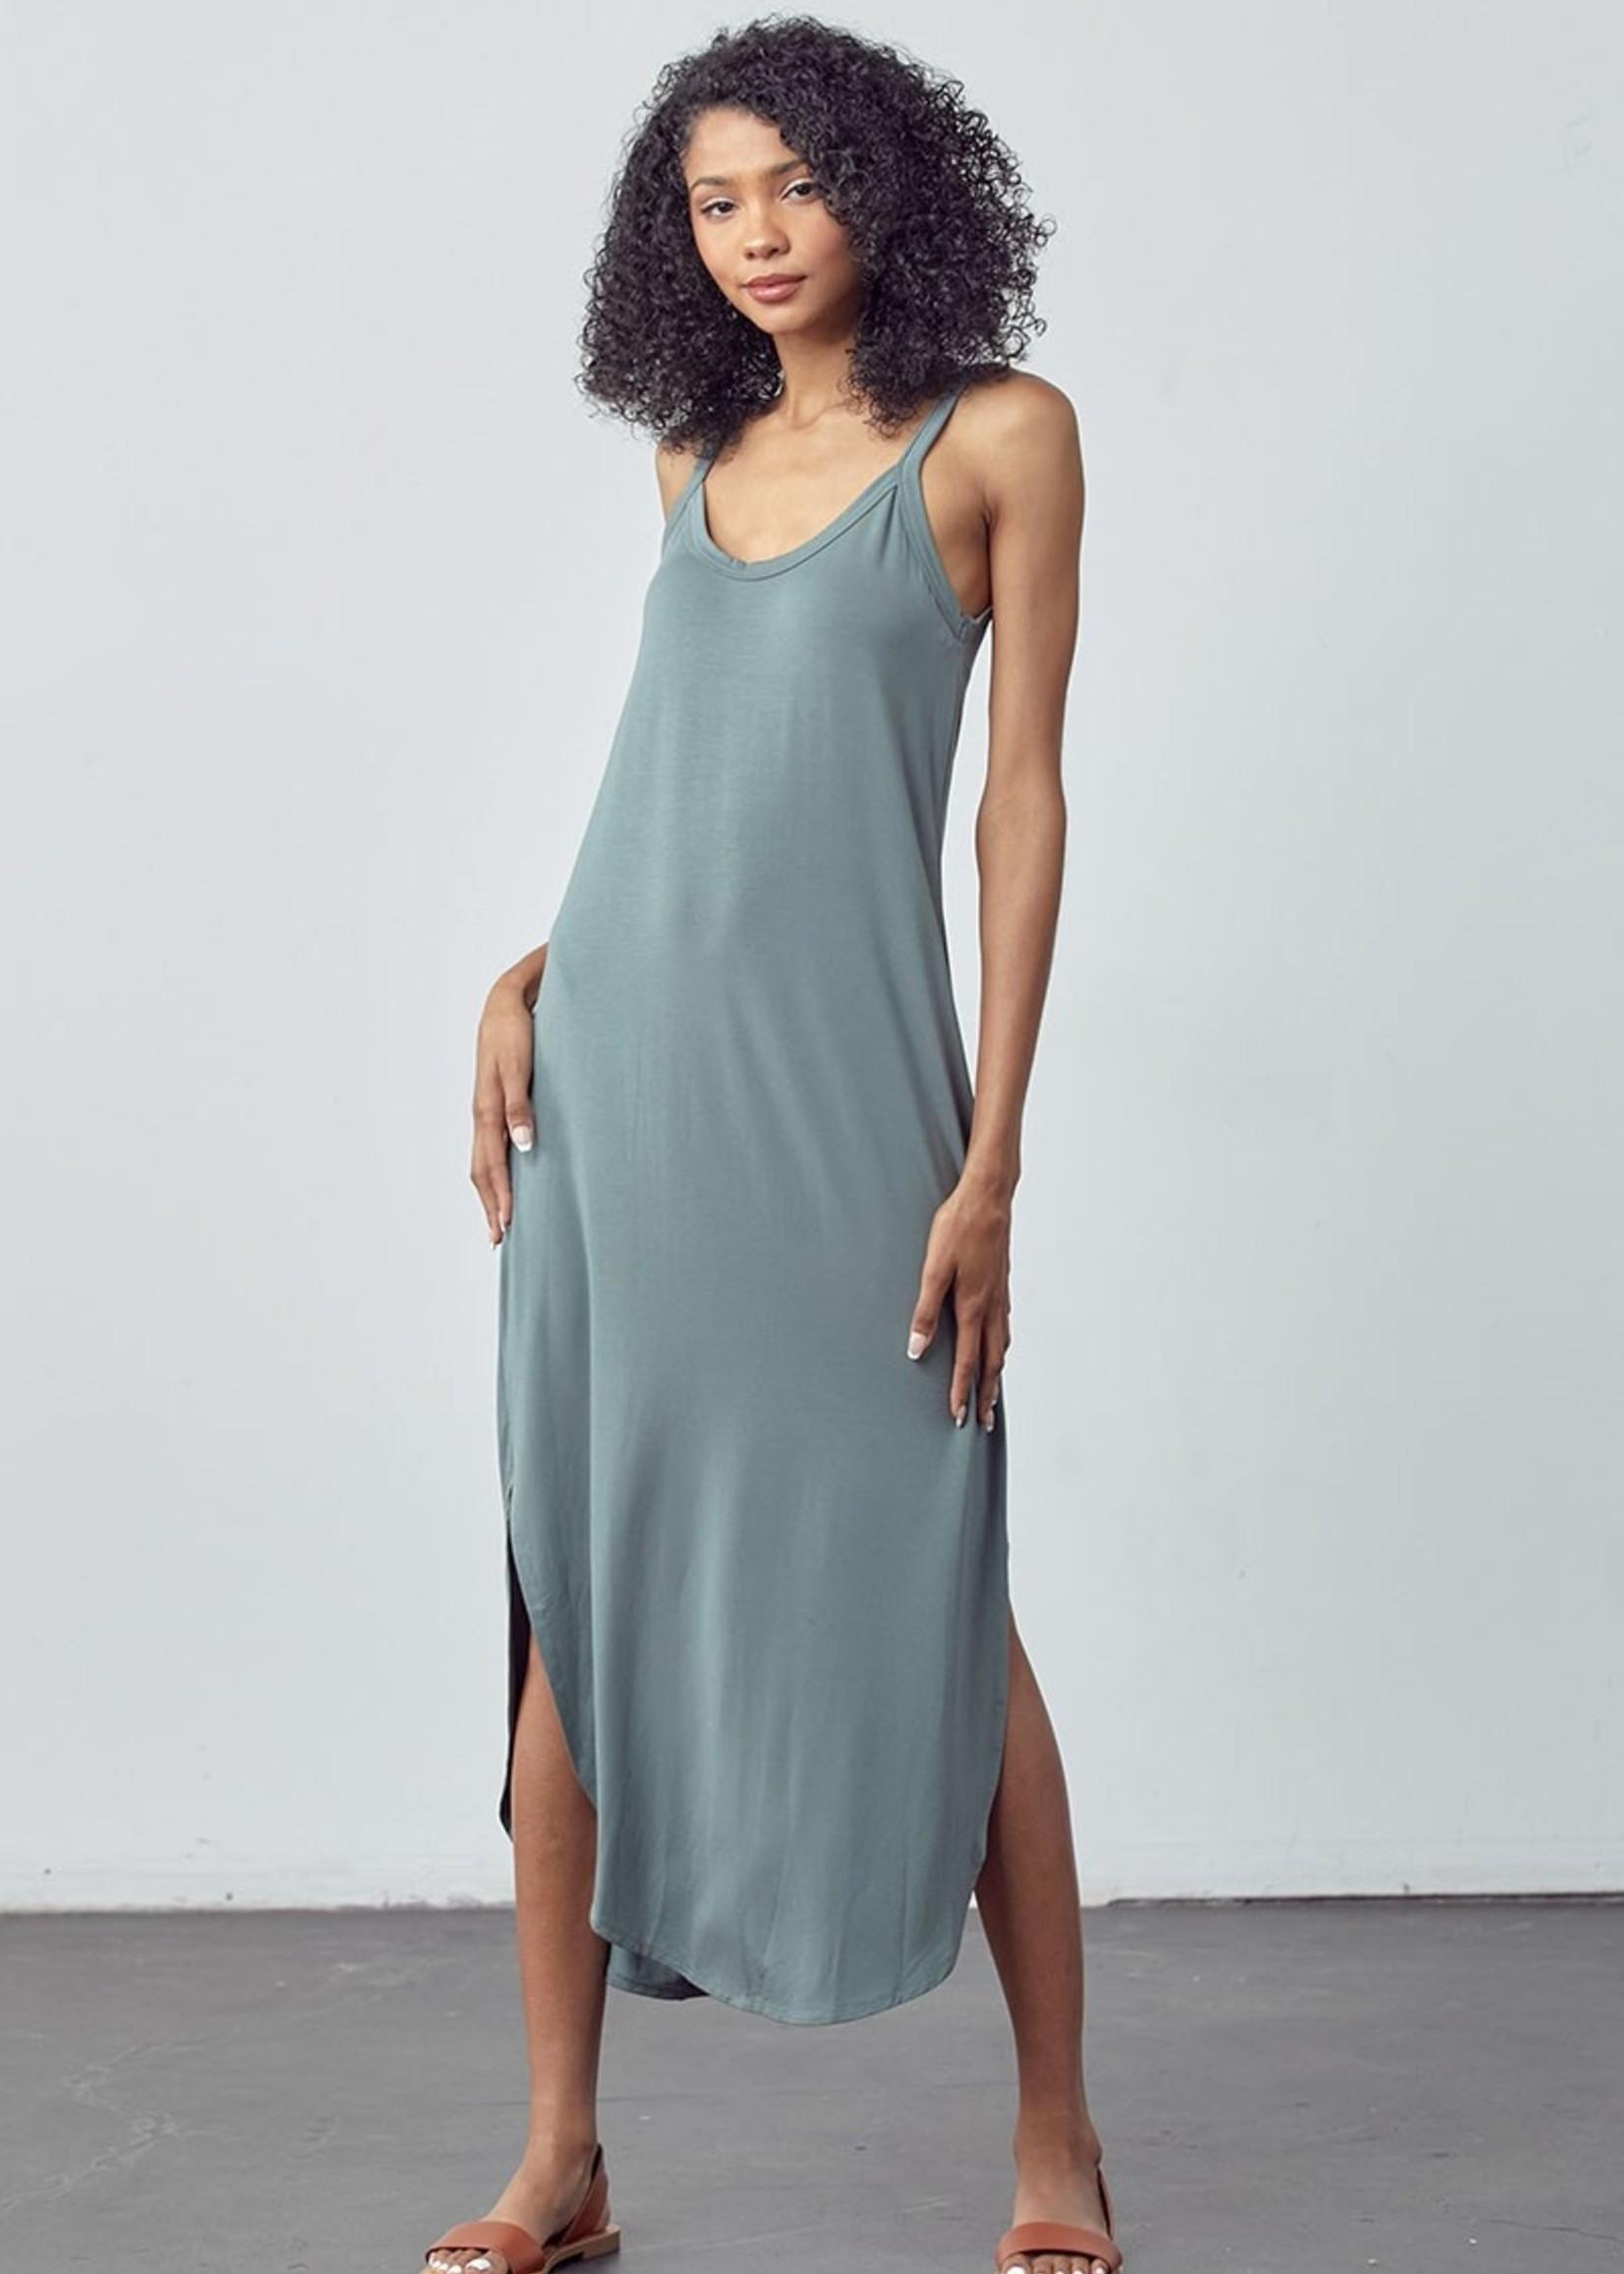 Scoop Neck Maxi Dress - Seafoam